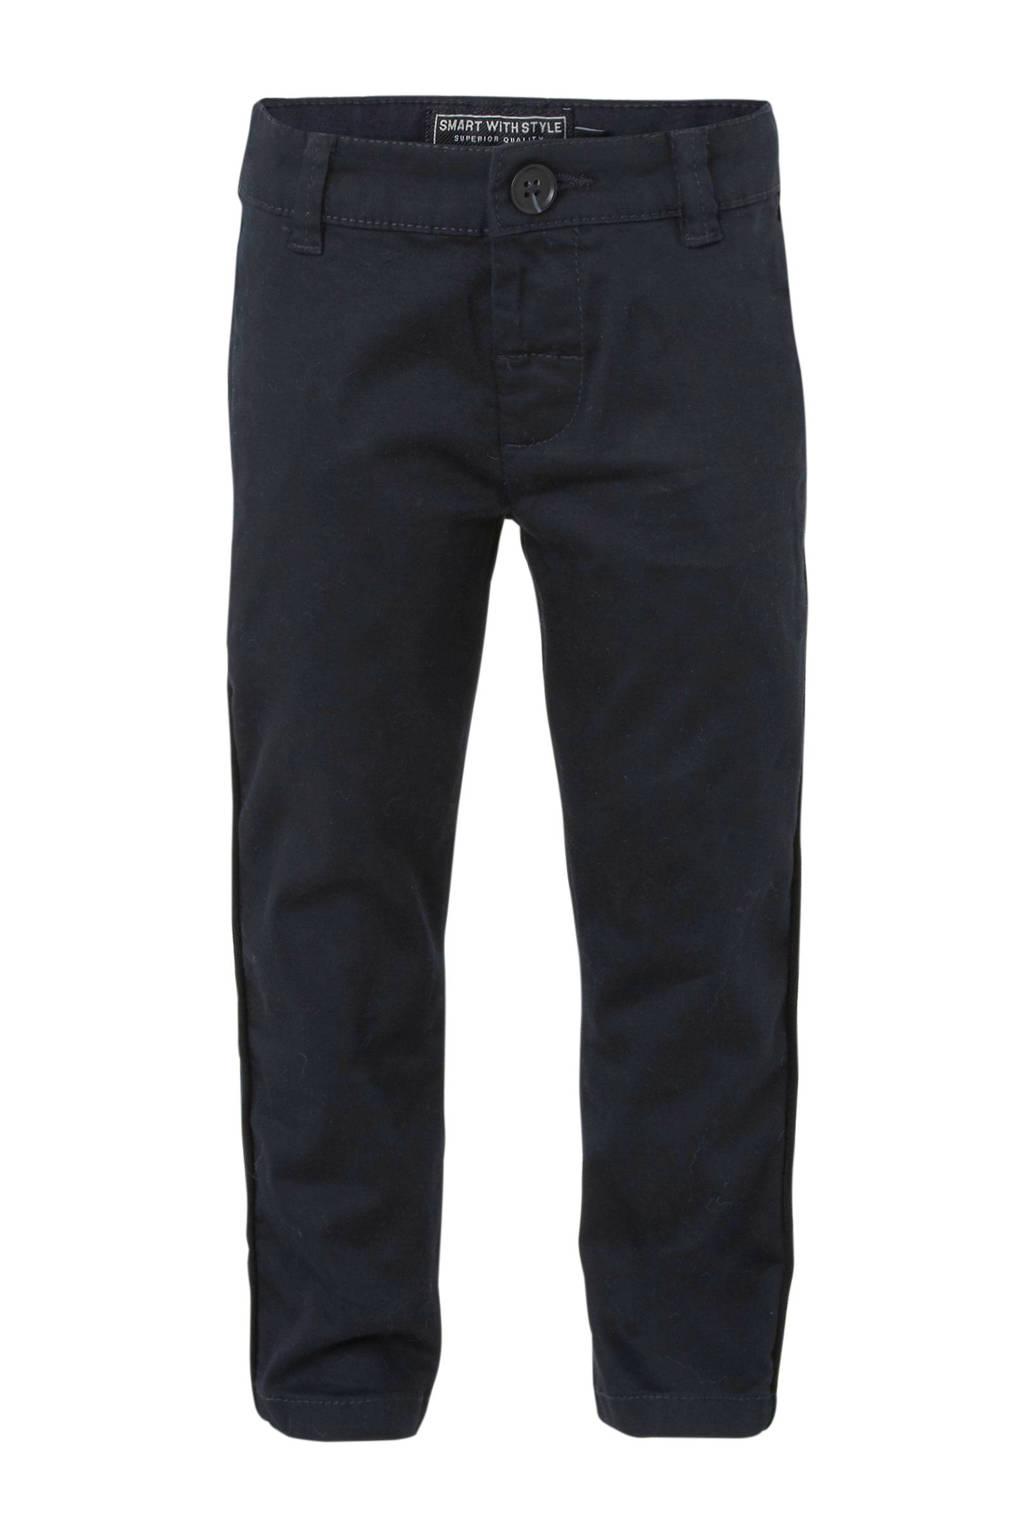 C&A Palomino skinny broek zwart, Zwart